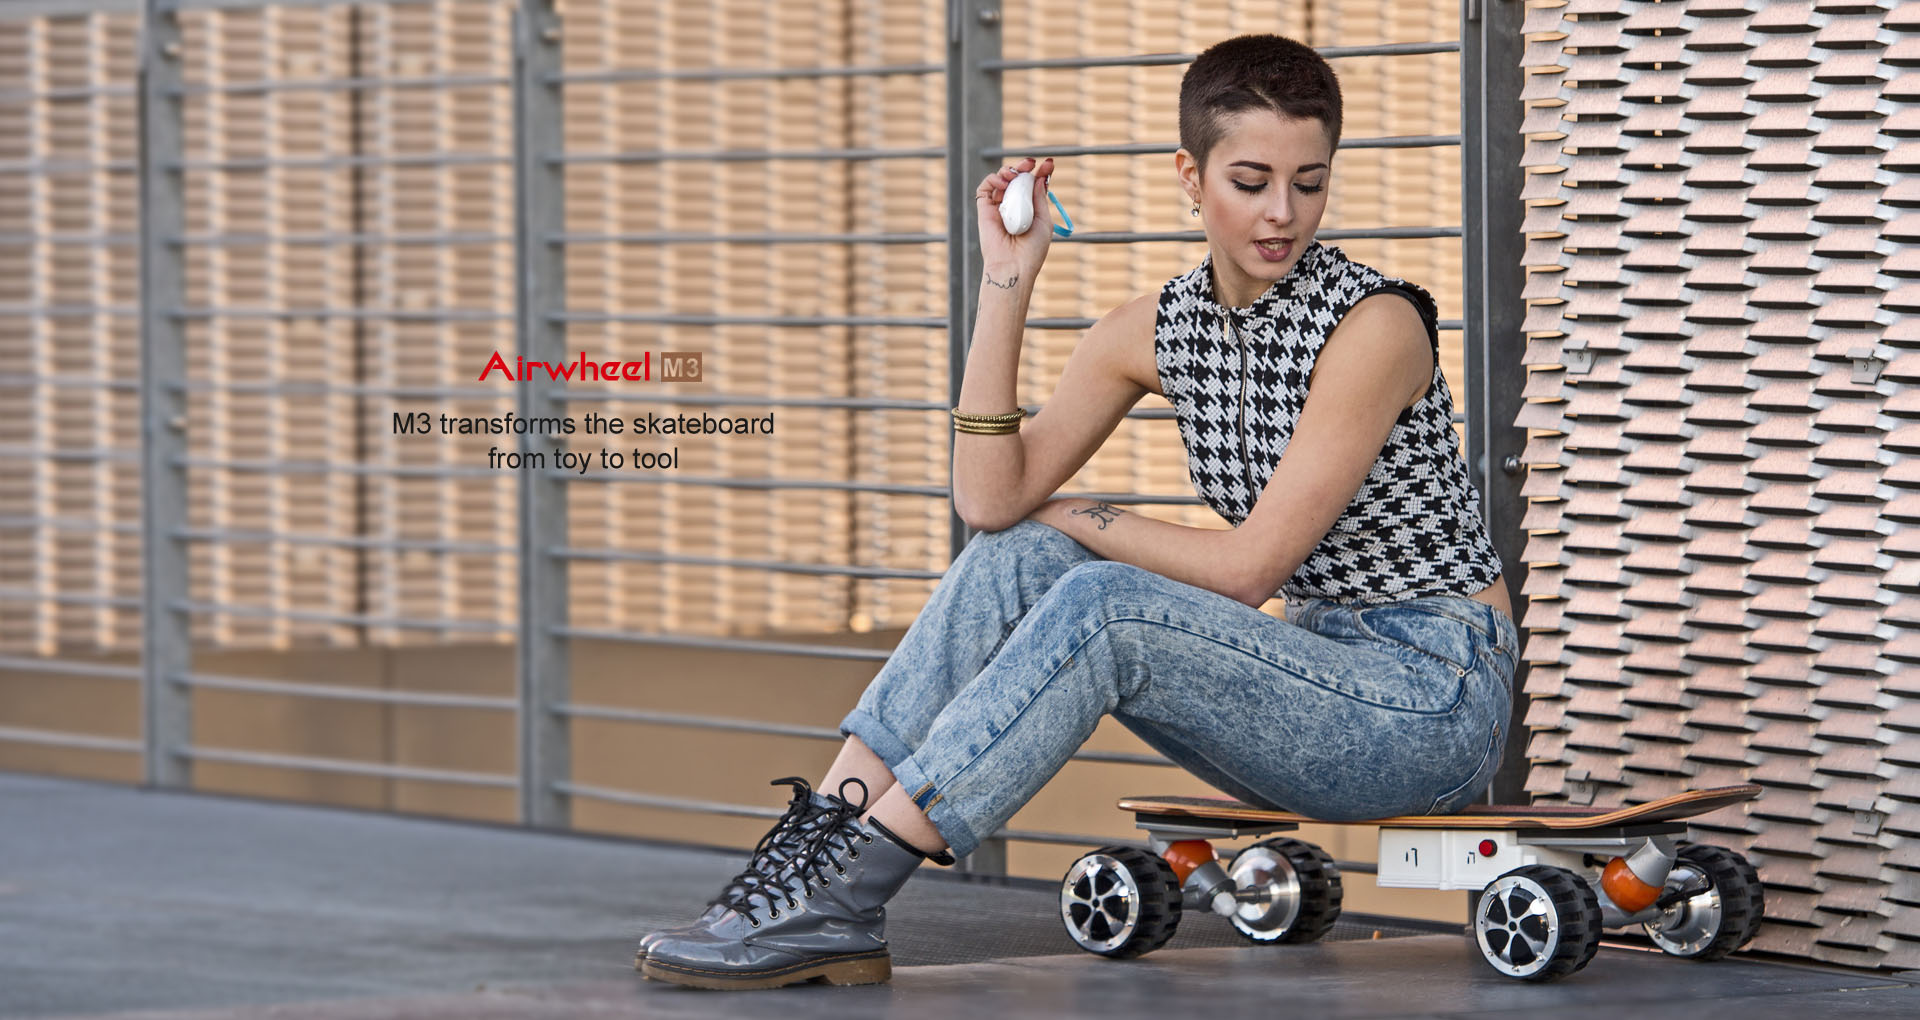 skateboard M3